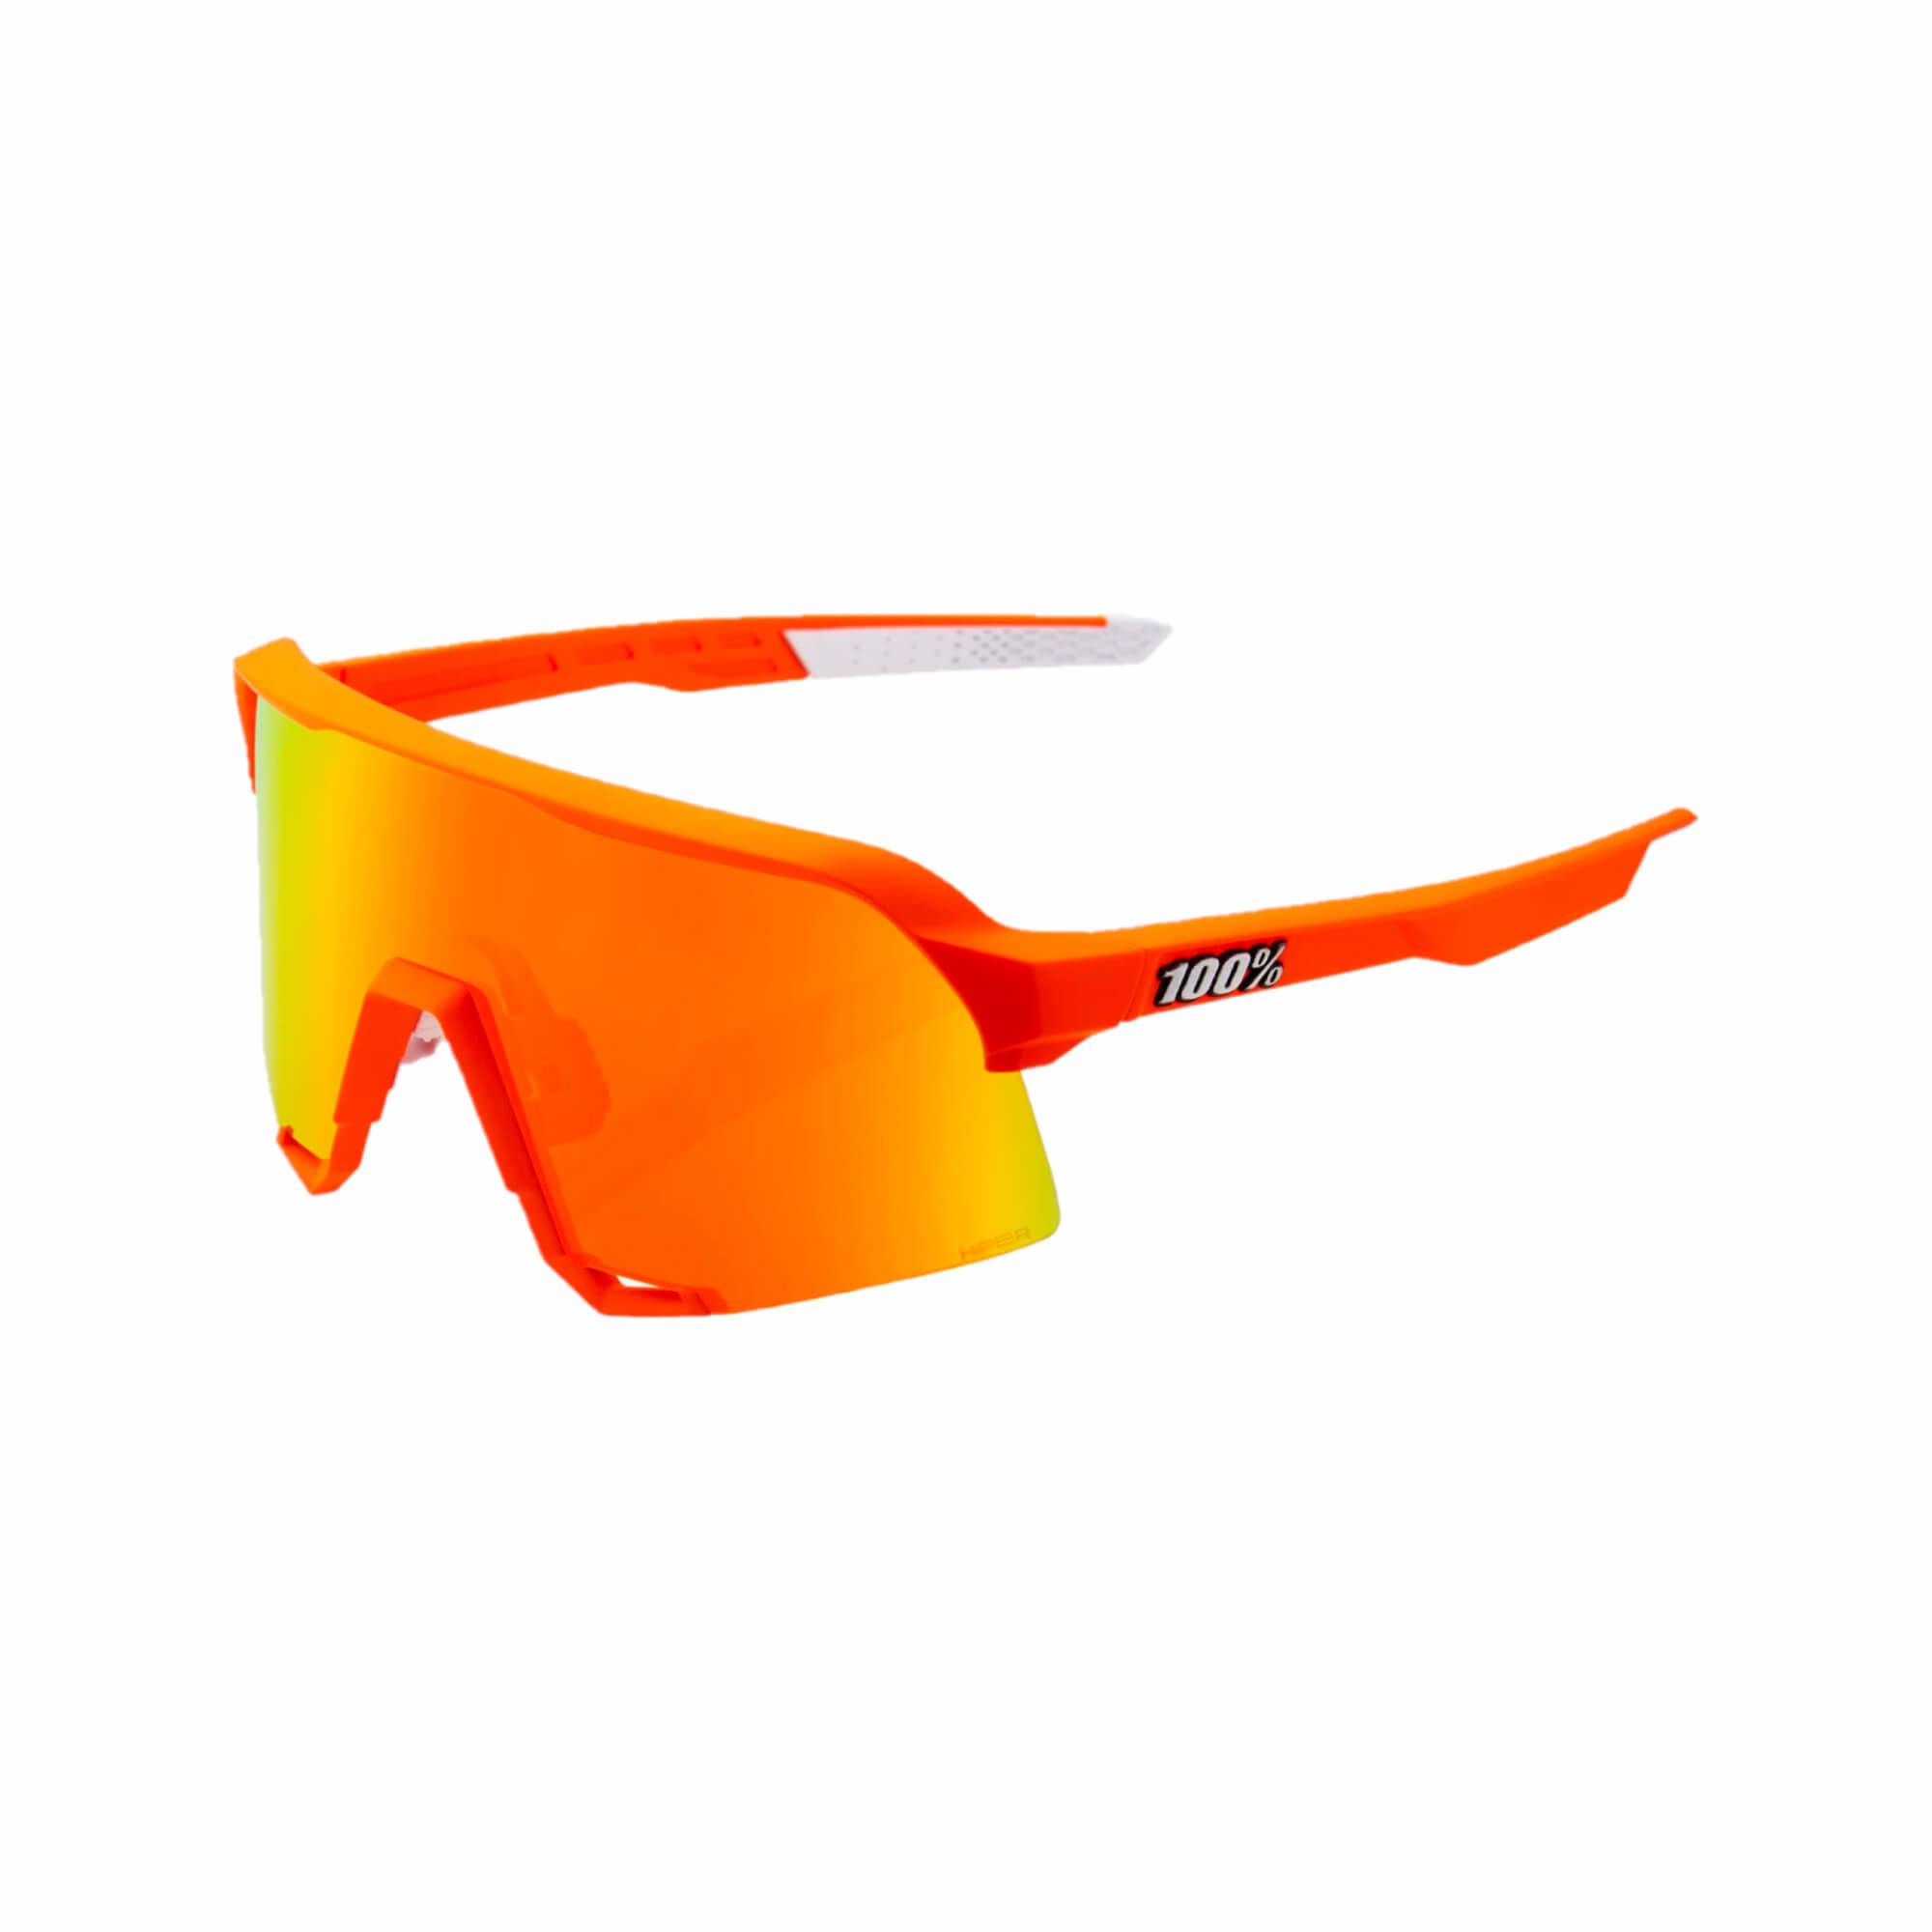 S3 Neon Orange Hyper Red Multilayer-1